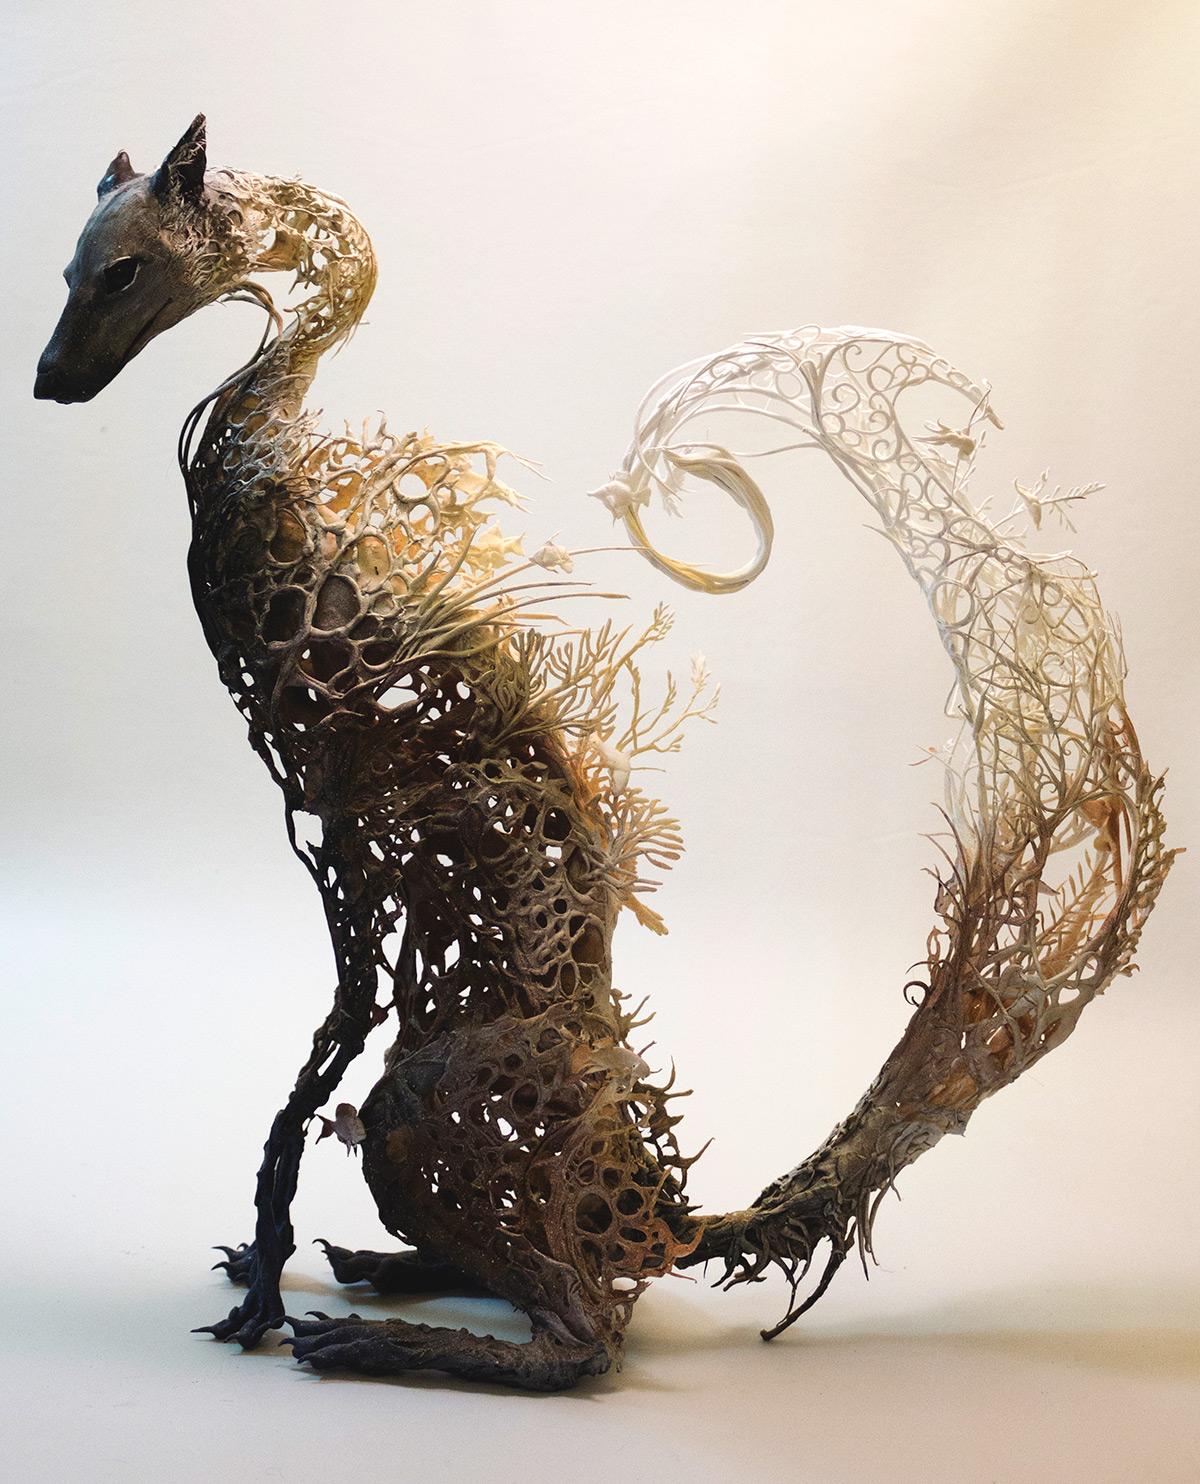 ellen animals sheep sculptures fusion plants jewett surrealist artist